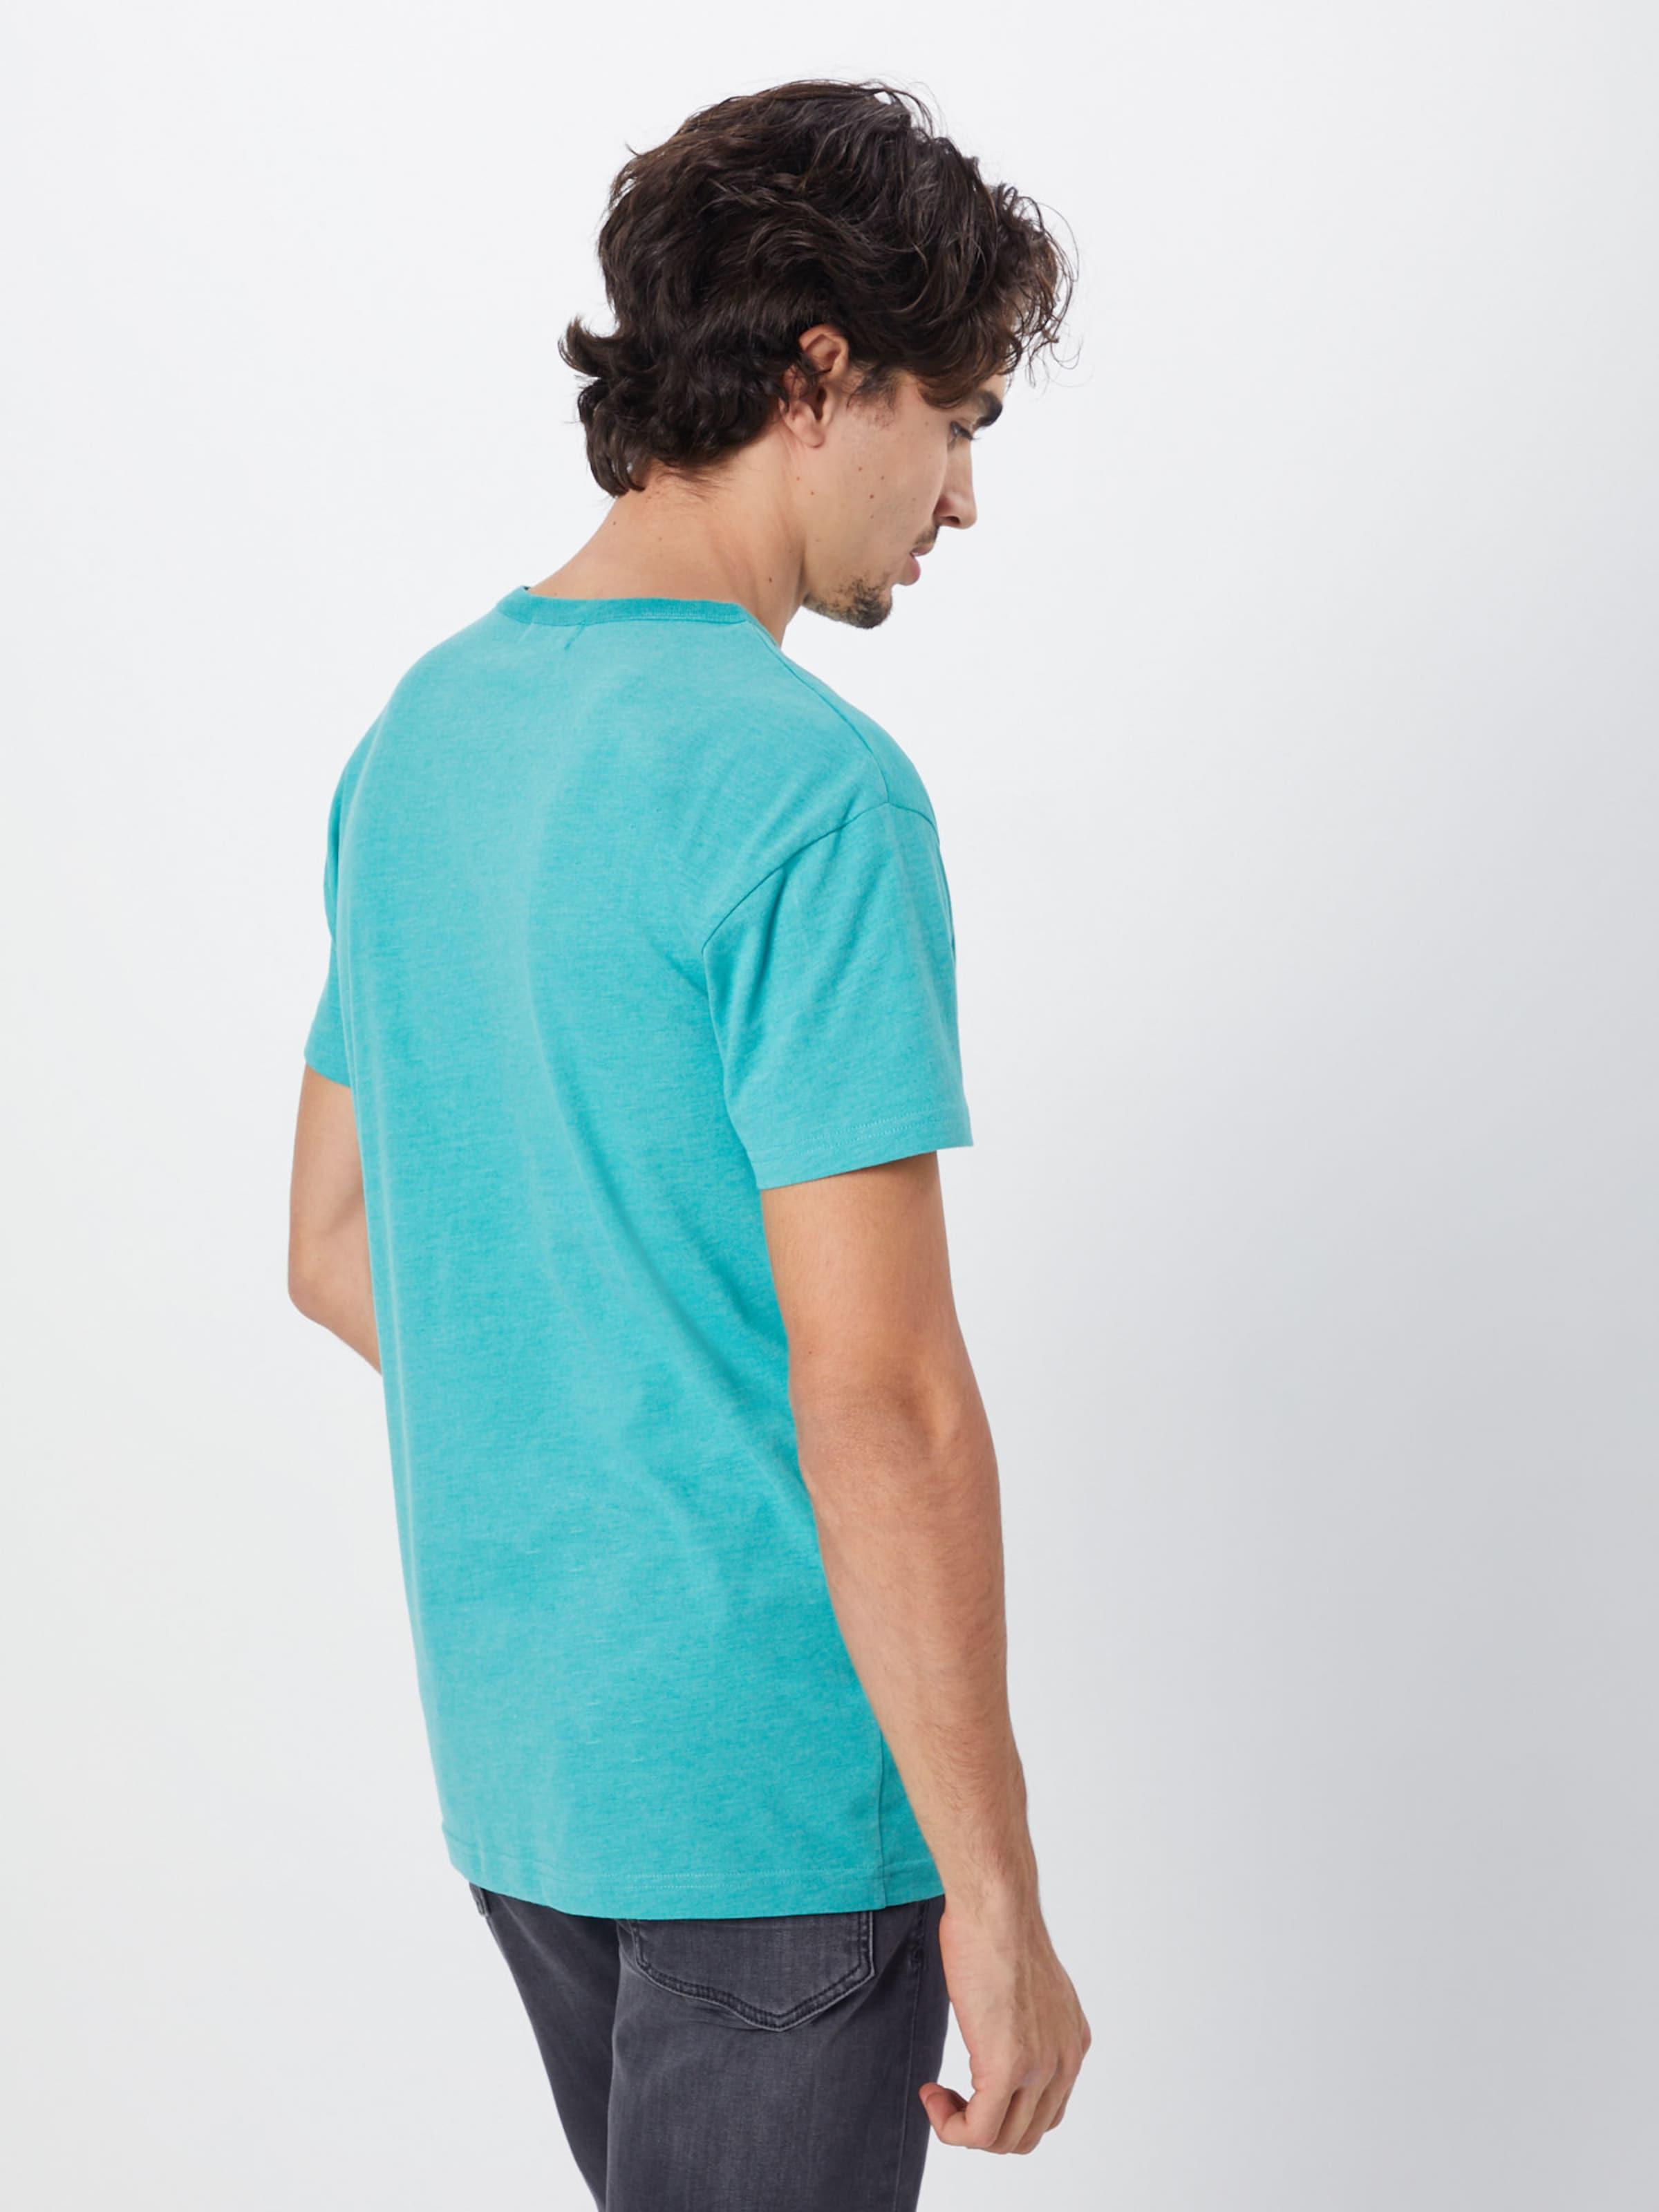 'boombox' Derbe En T TurquoiseNoir shirt LSzMVUGpq